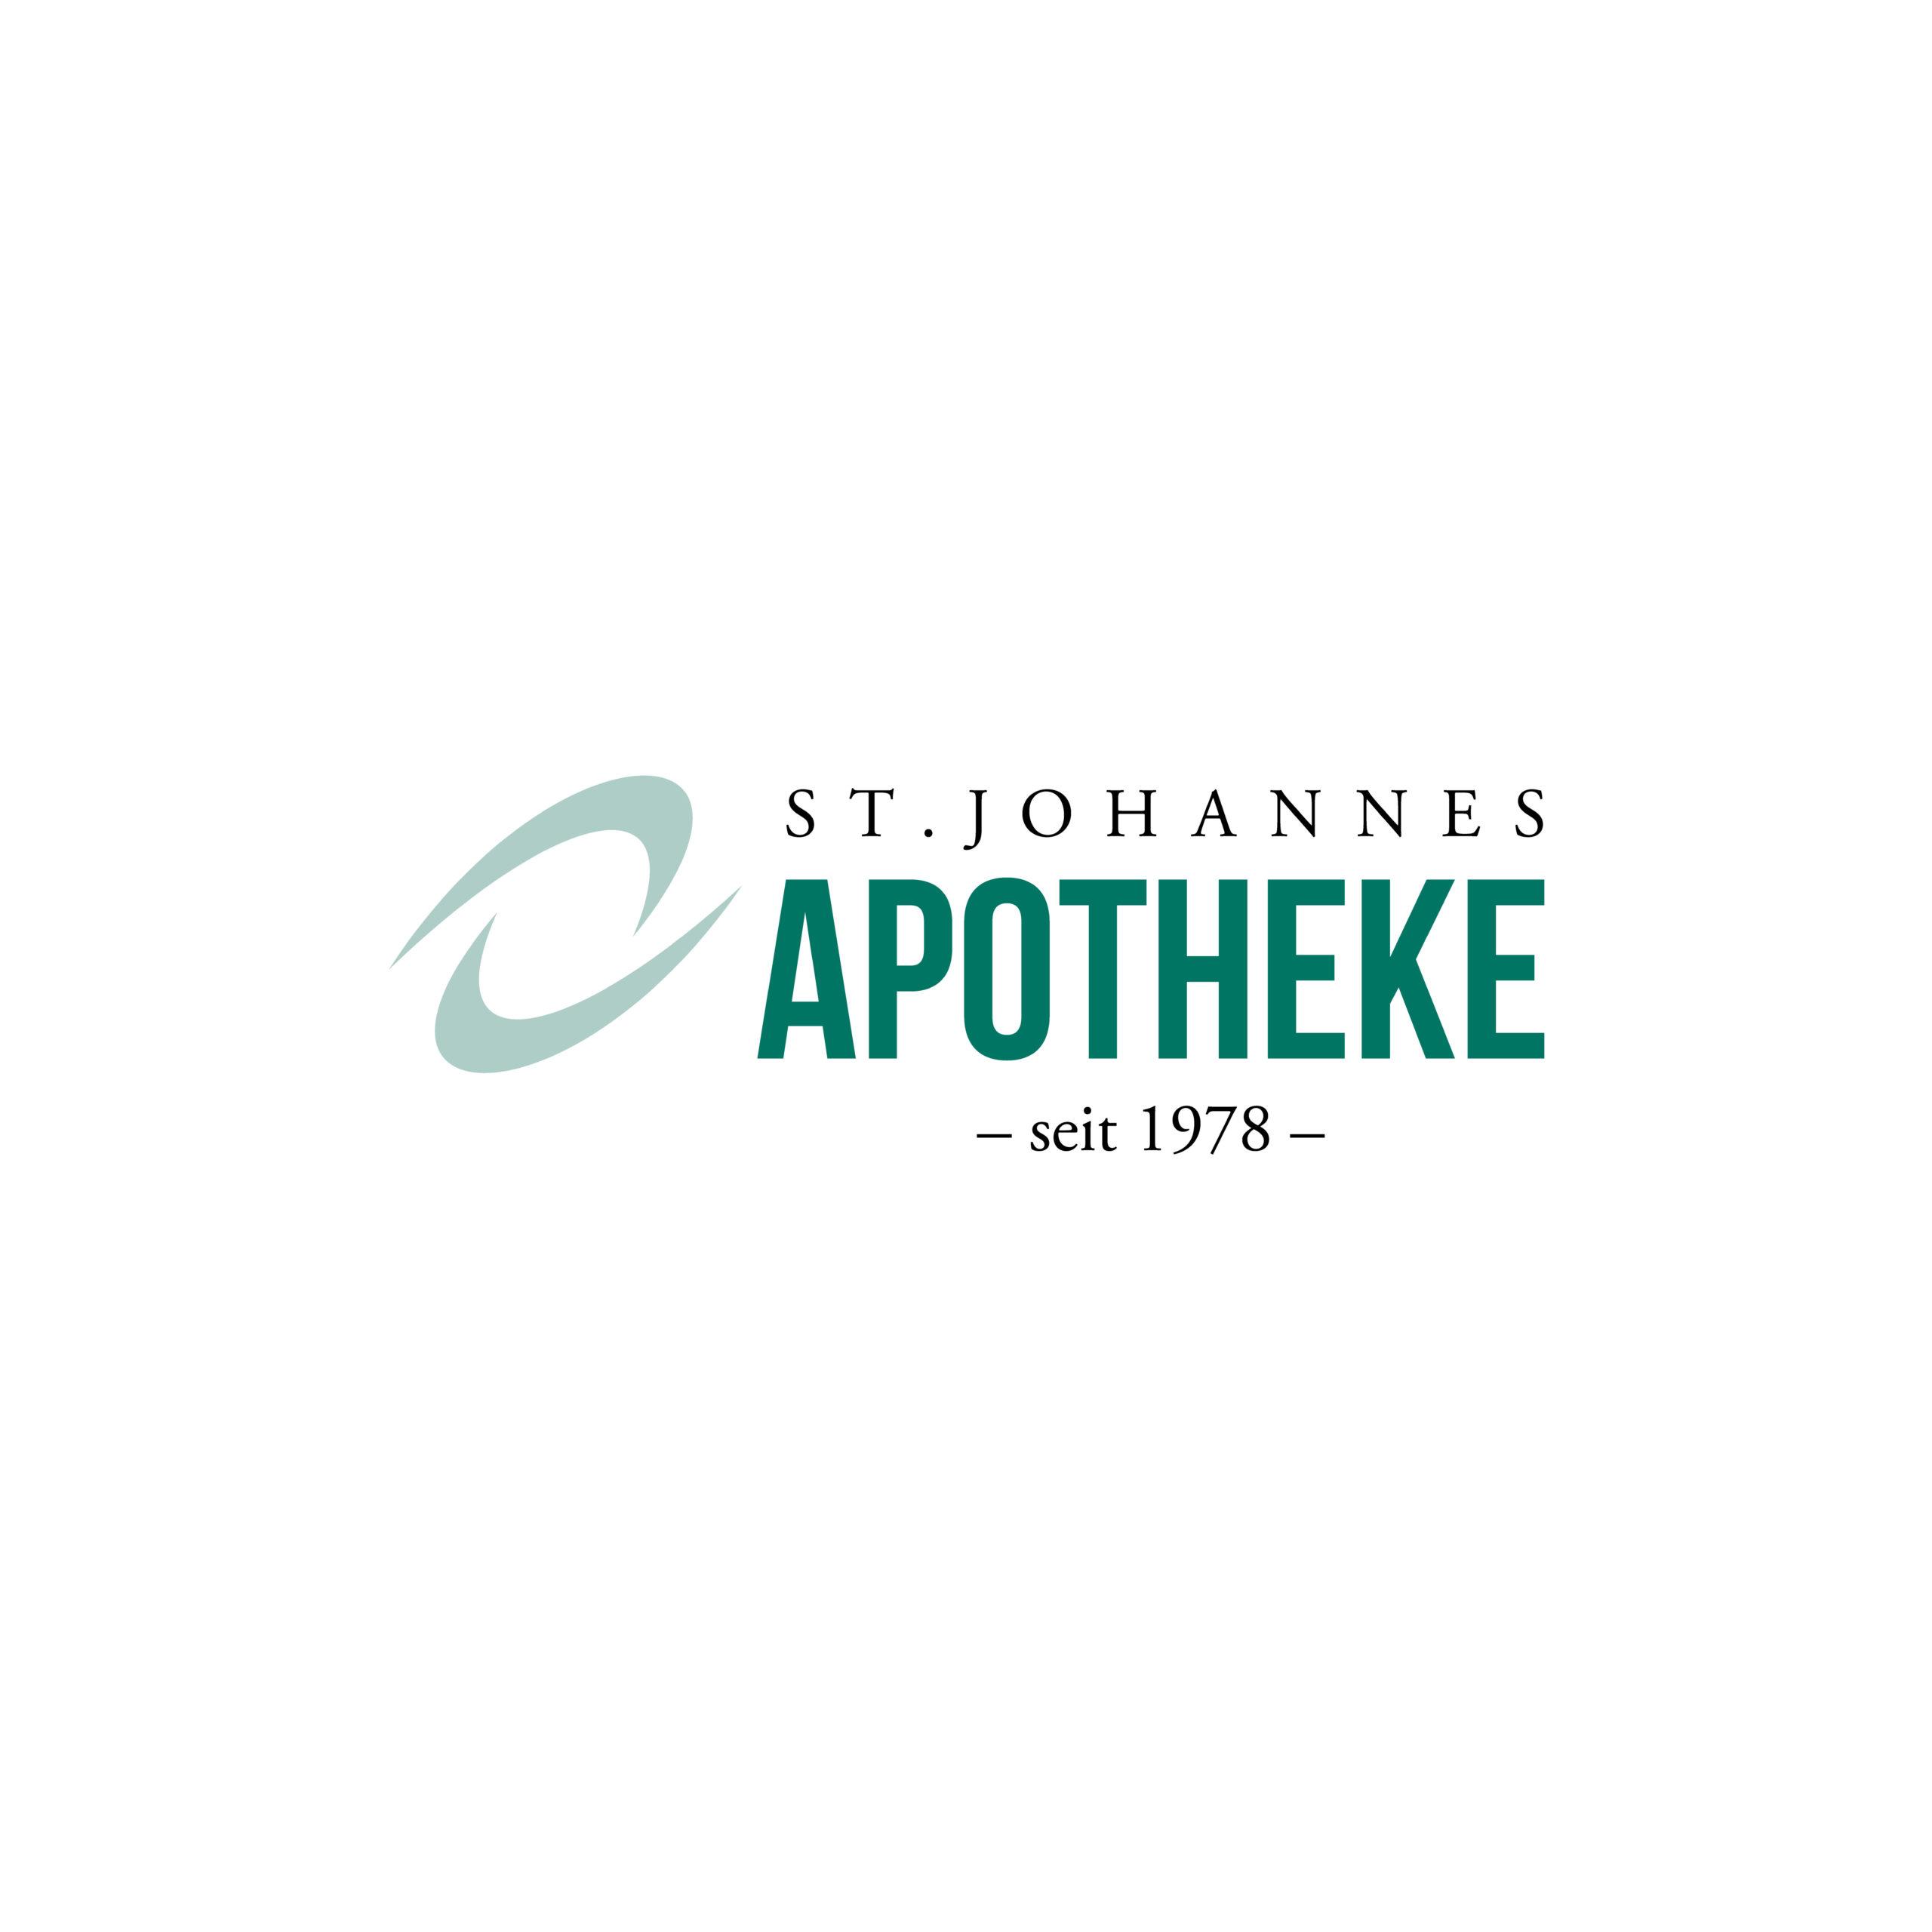 St. Johannes Apotheke